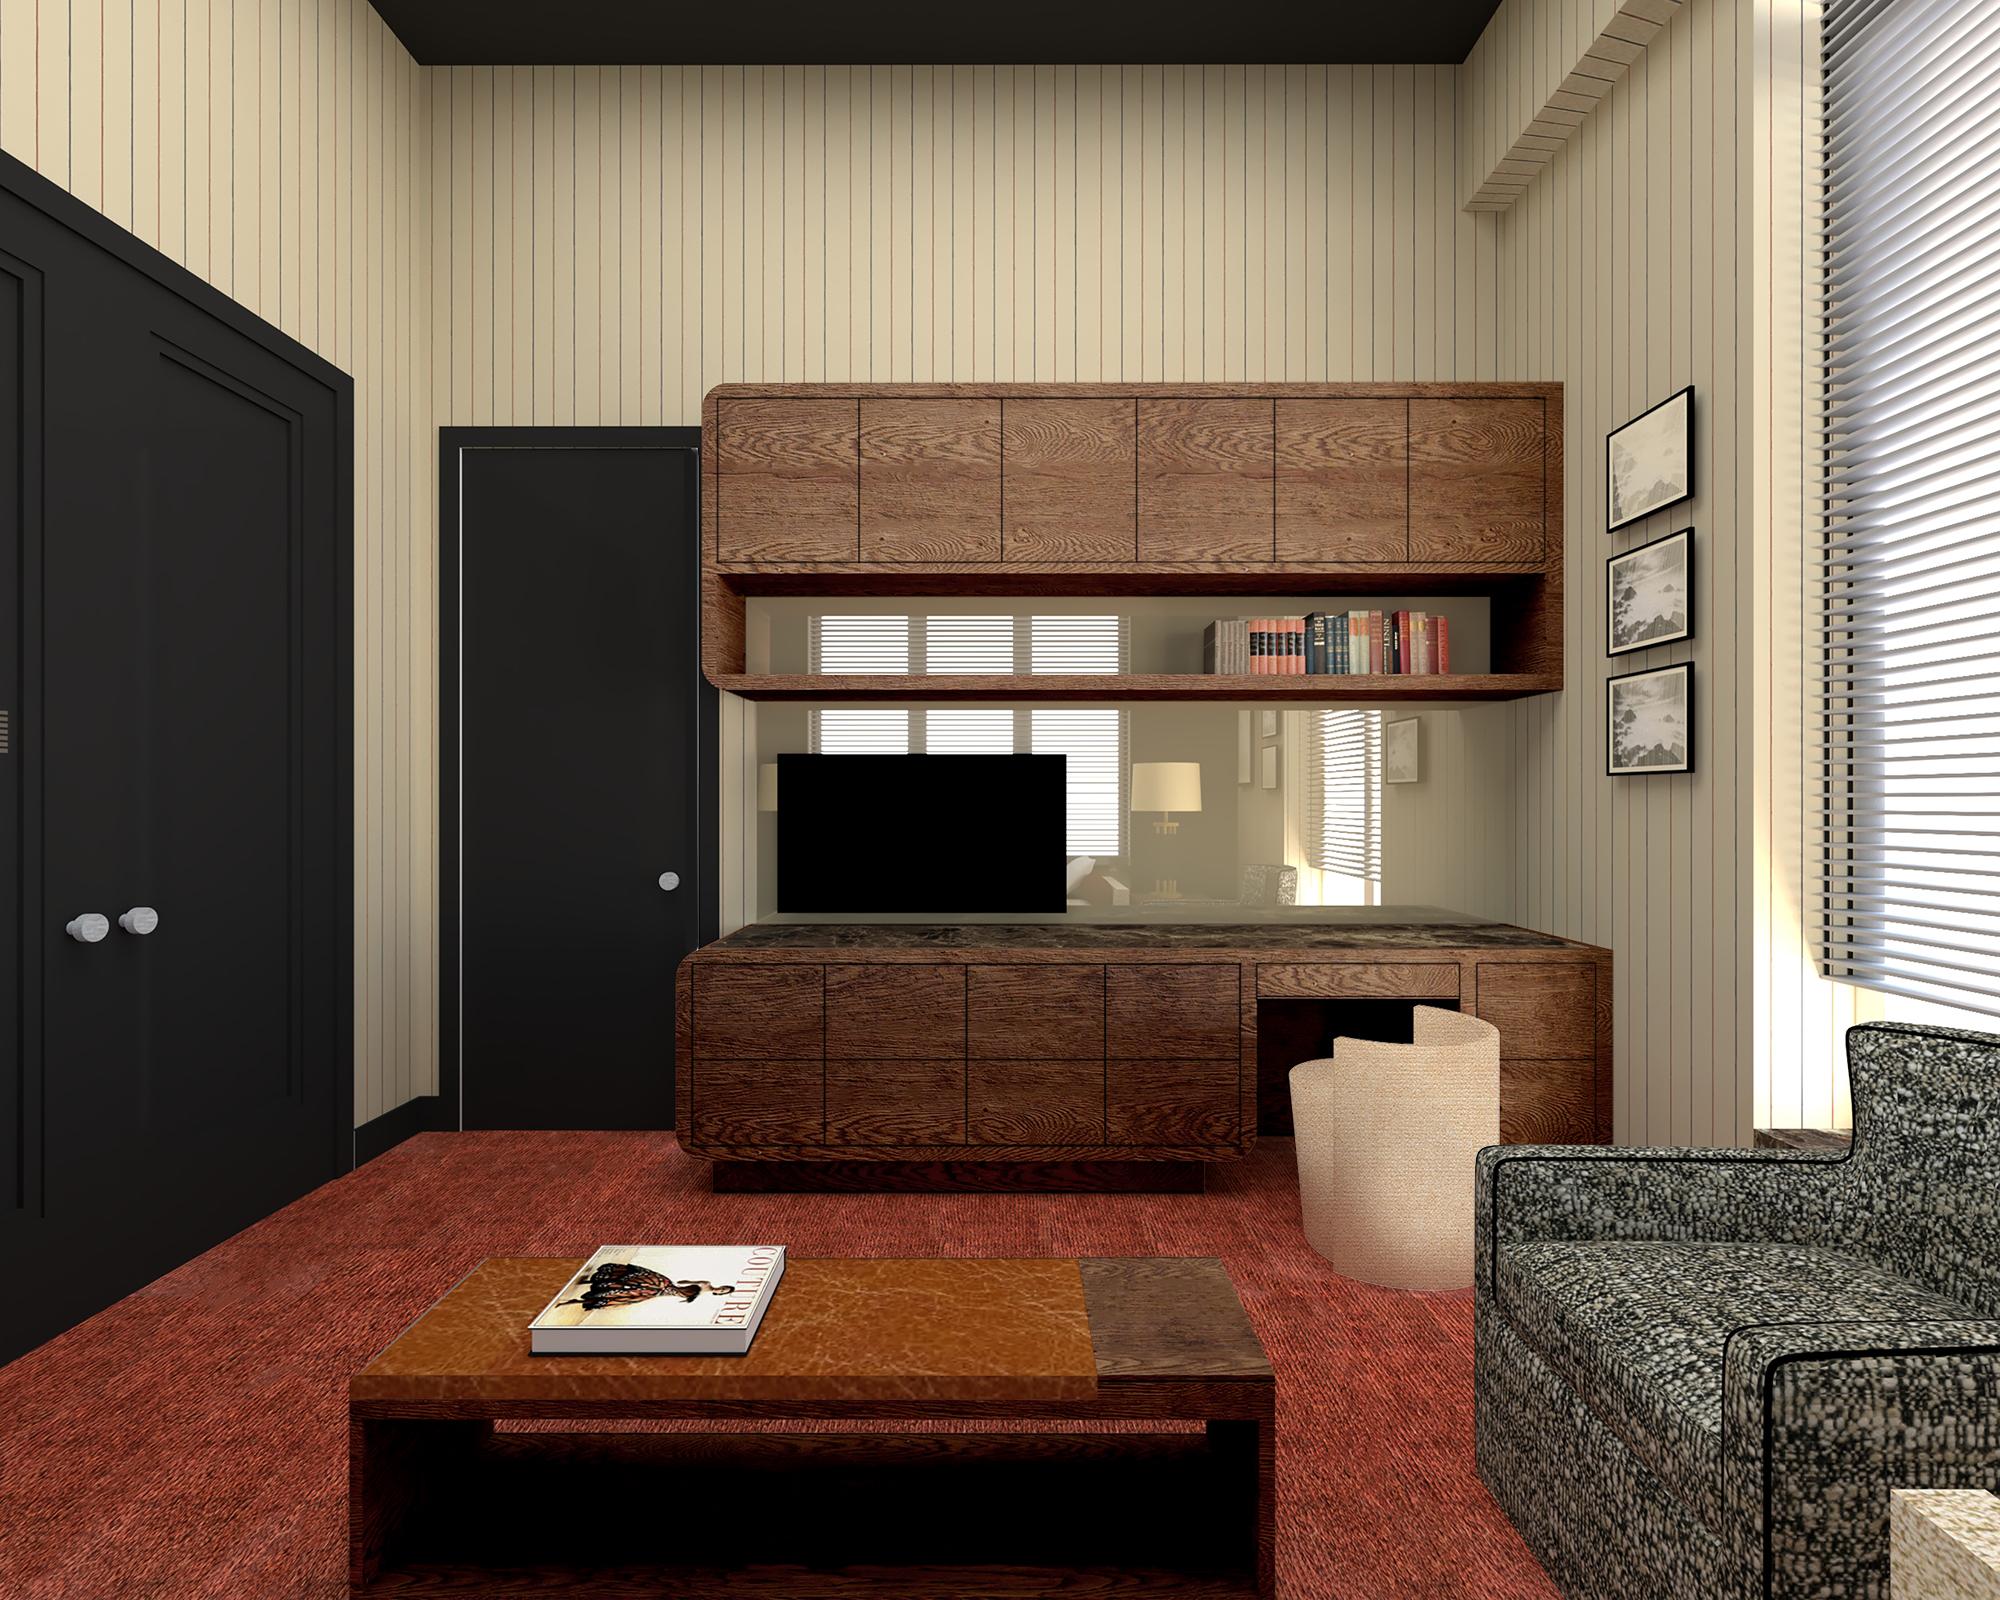 claudia-giselle-design-penthouse.jpg